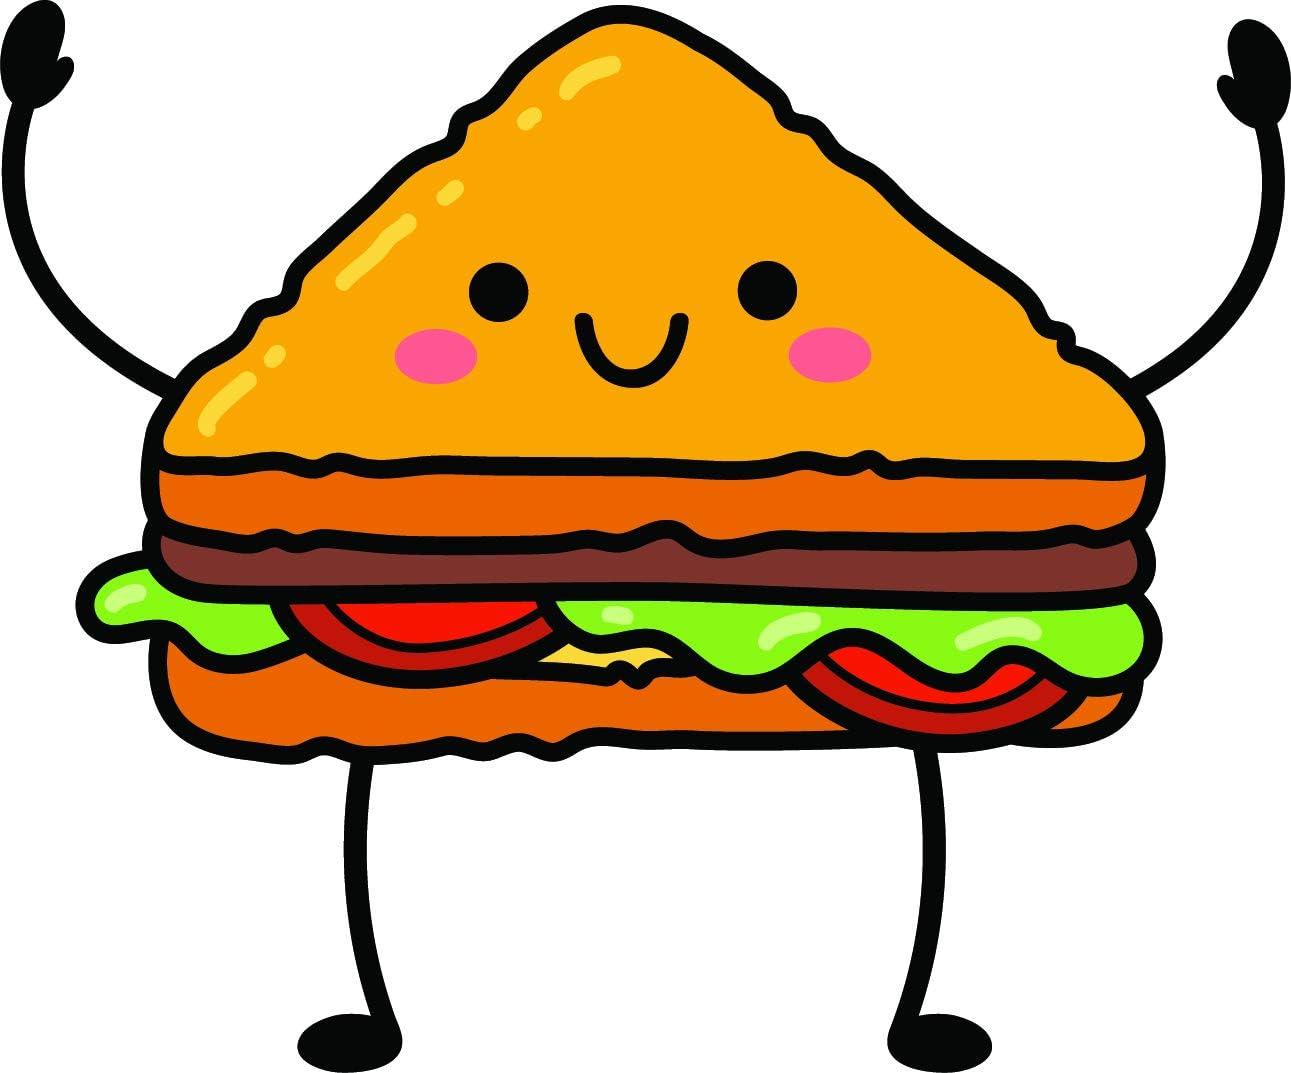 amazon com simple kawaii food foodie cartoon emoji vinyl sticker 12 wide sandwich automotive simple kawaii food foodie cartoon emoji vinyl sticker 12 wide sandwich